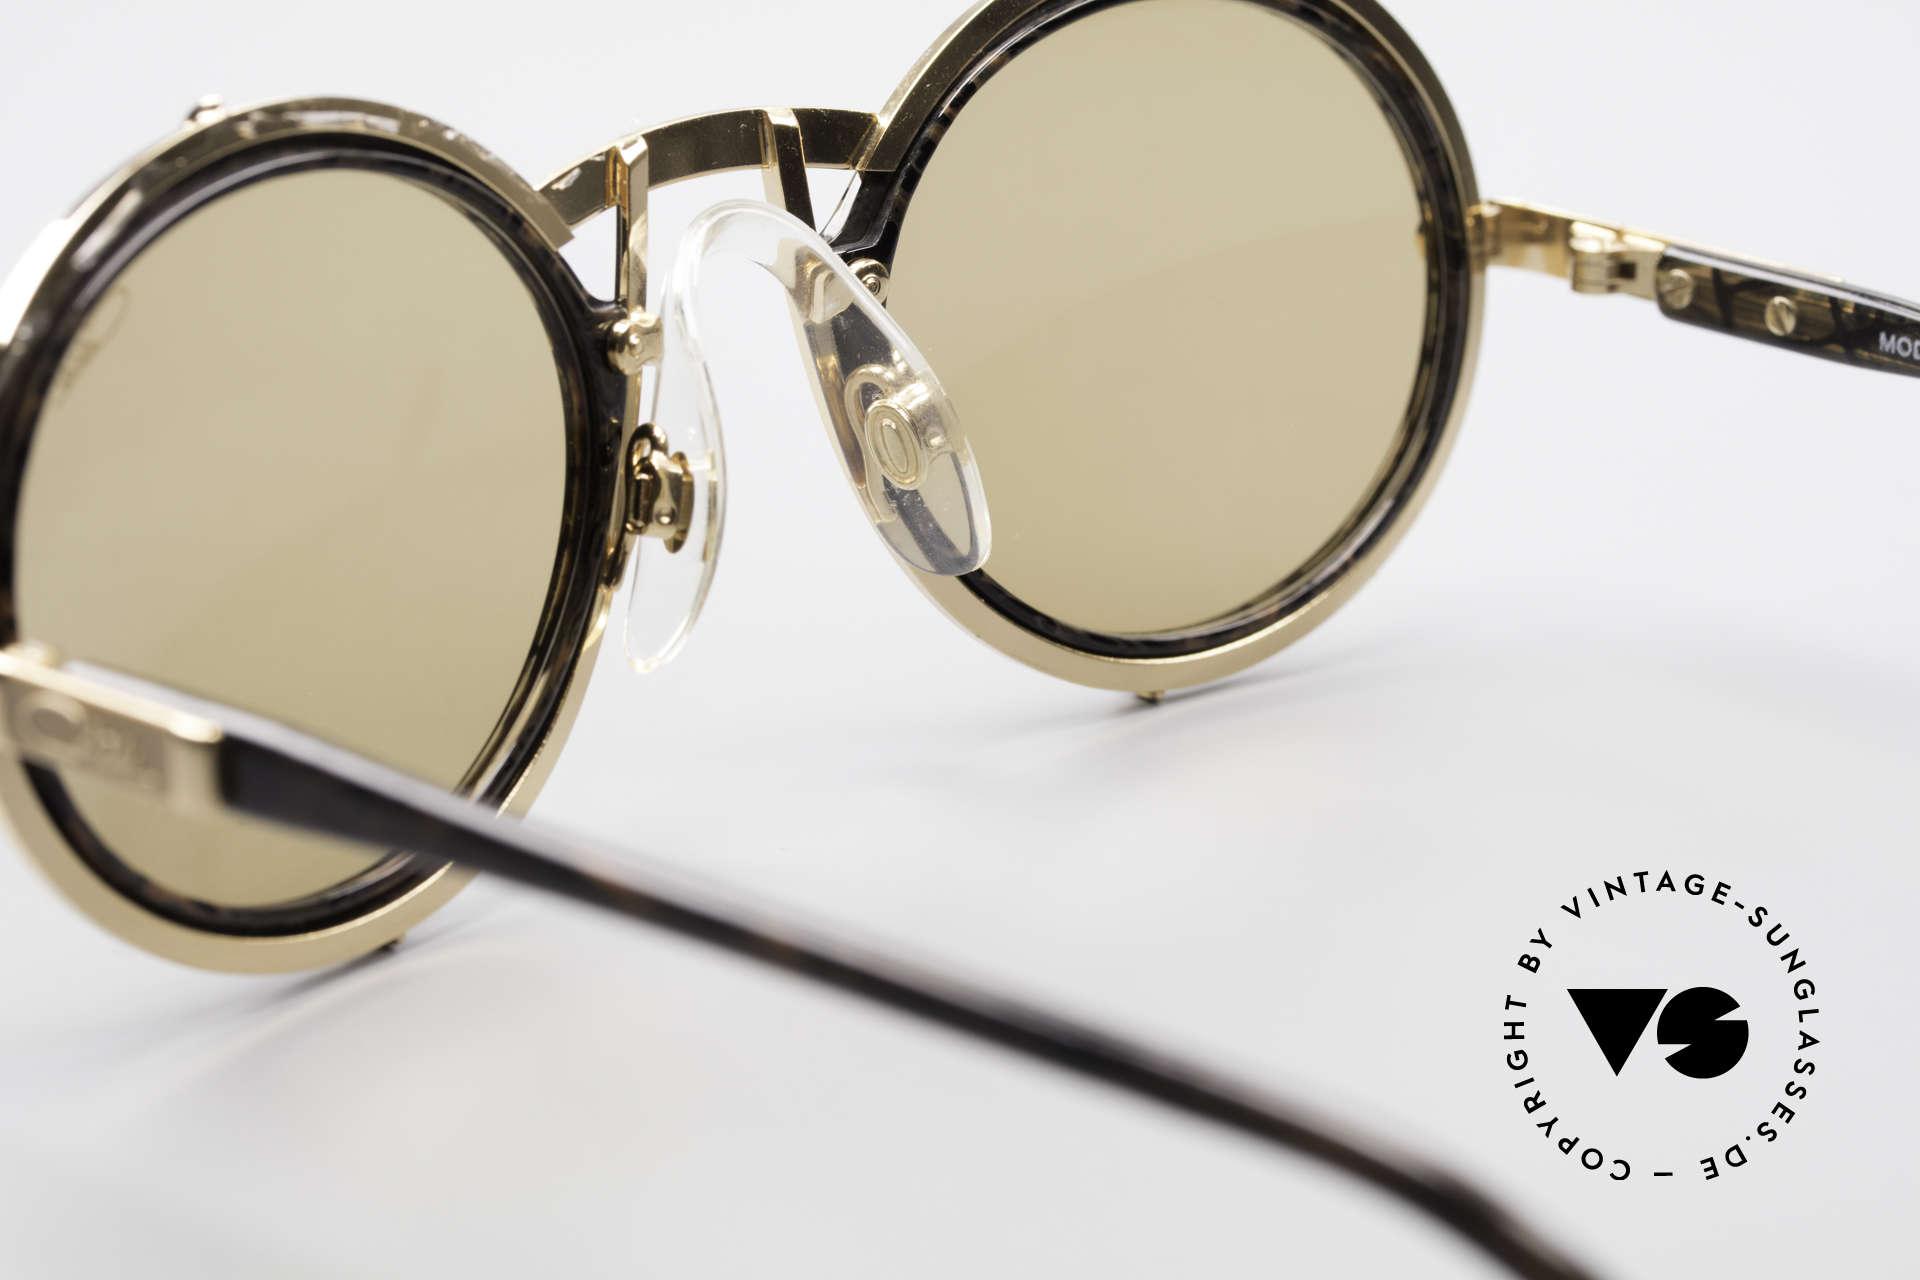 Cazal 644 Round 90's Cazal Sunglasses, CAri ZALloni (CaZal) wore this model in private, Made for Men and Women